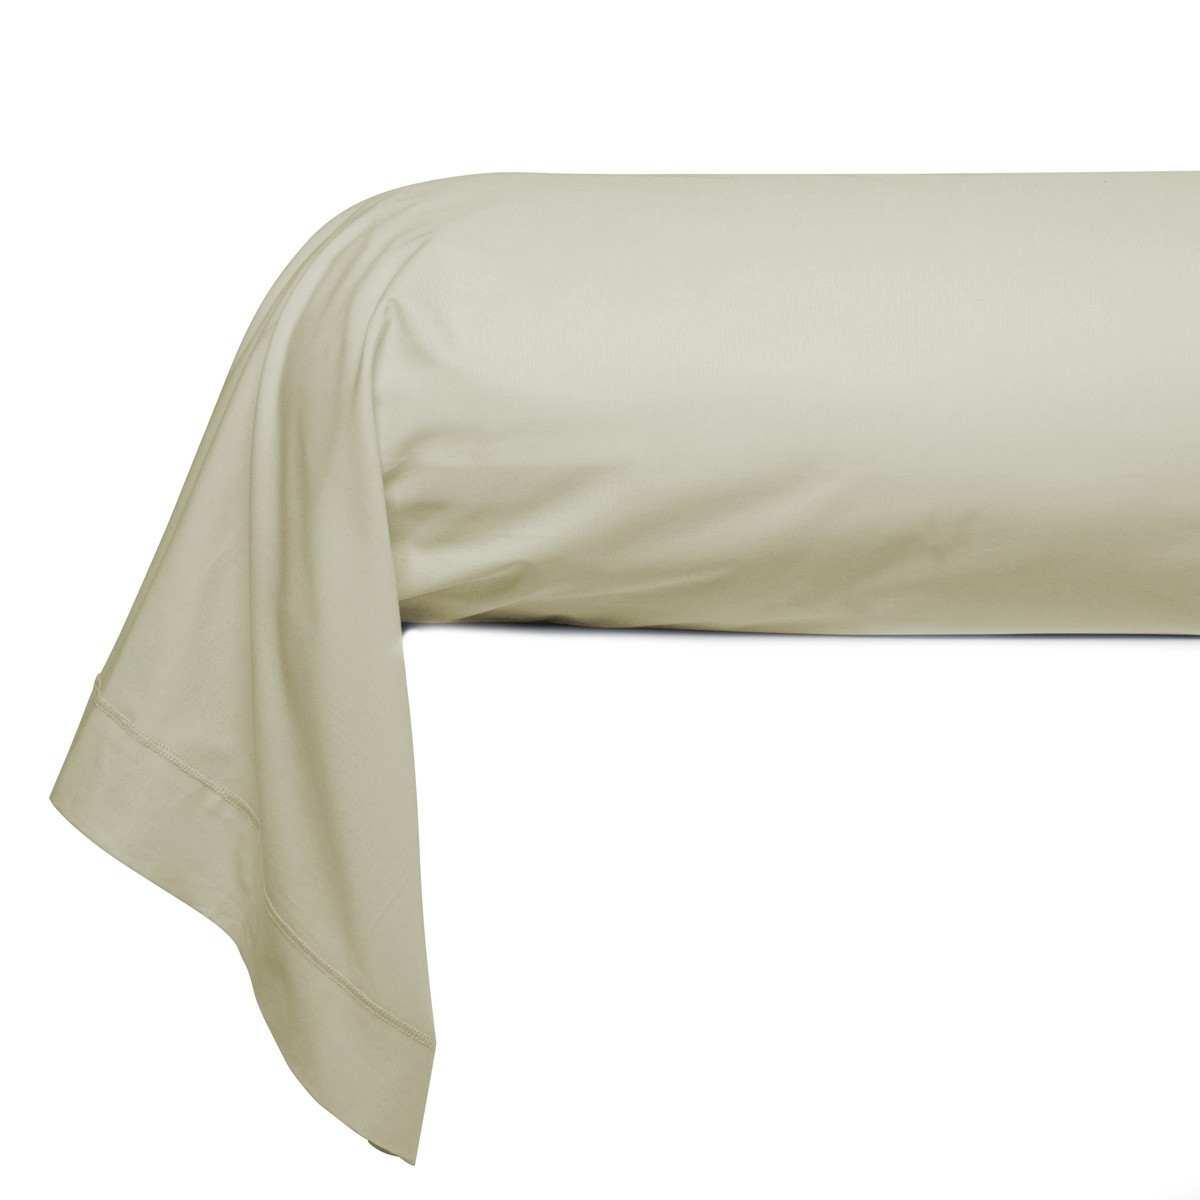 Taie traversin unie percale soldes jusqu 39 55 linge - Linge de lit percale soldes ...